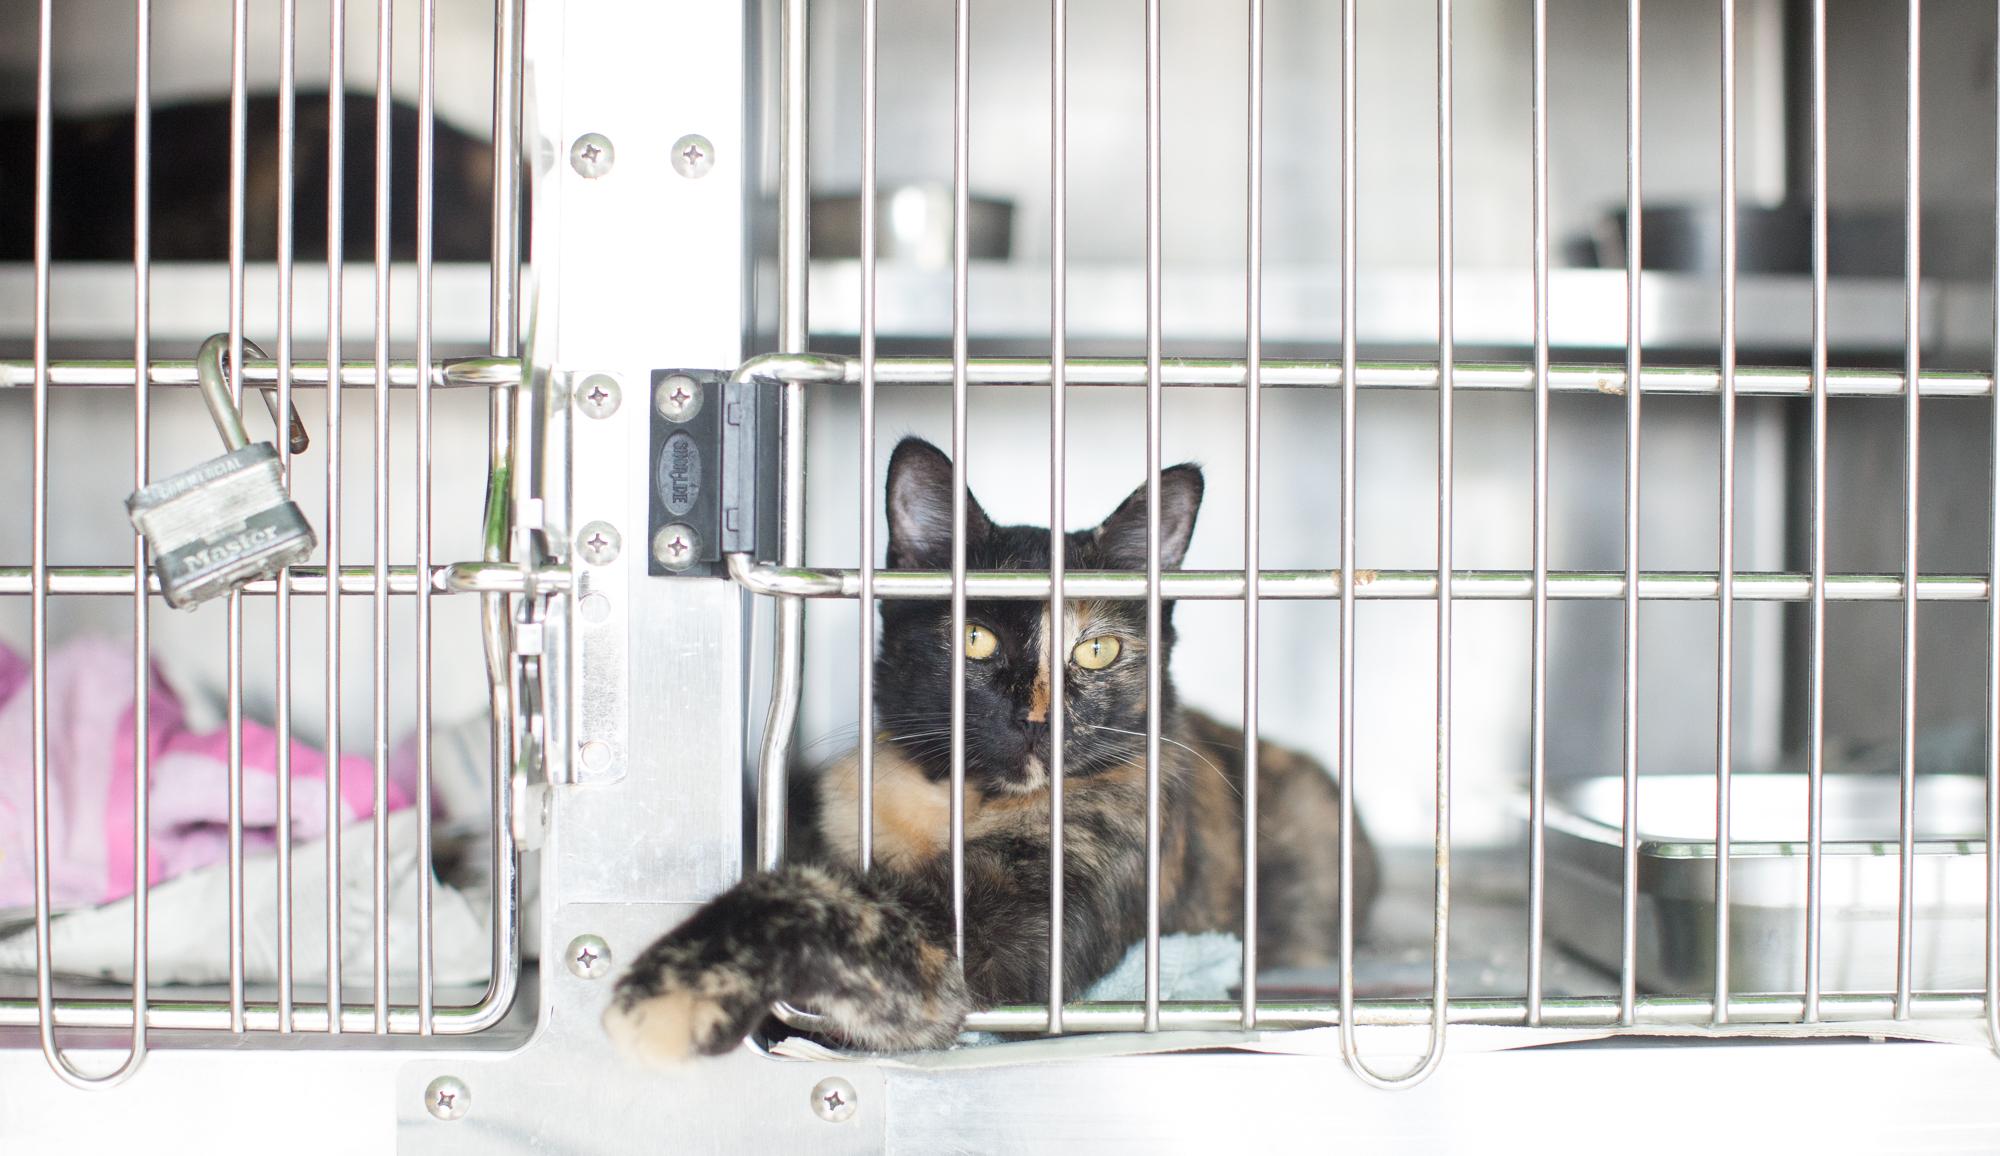 041_animal-photography-cats-dogs-volunteer_MG_8893.jpg